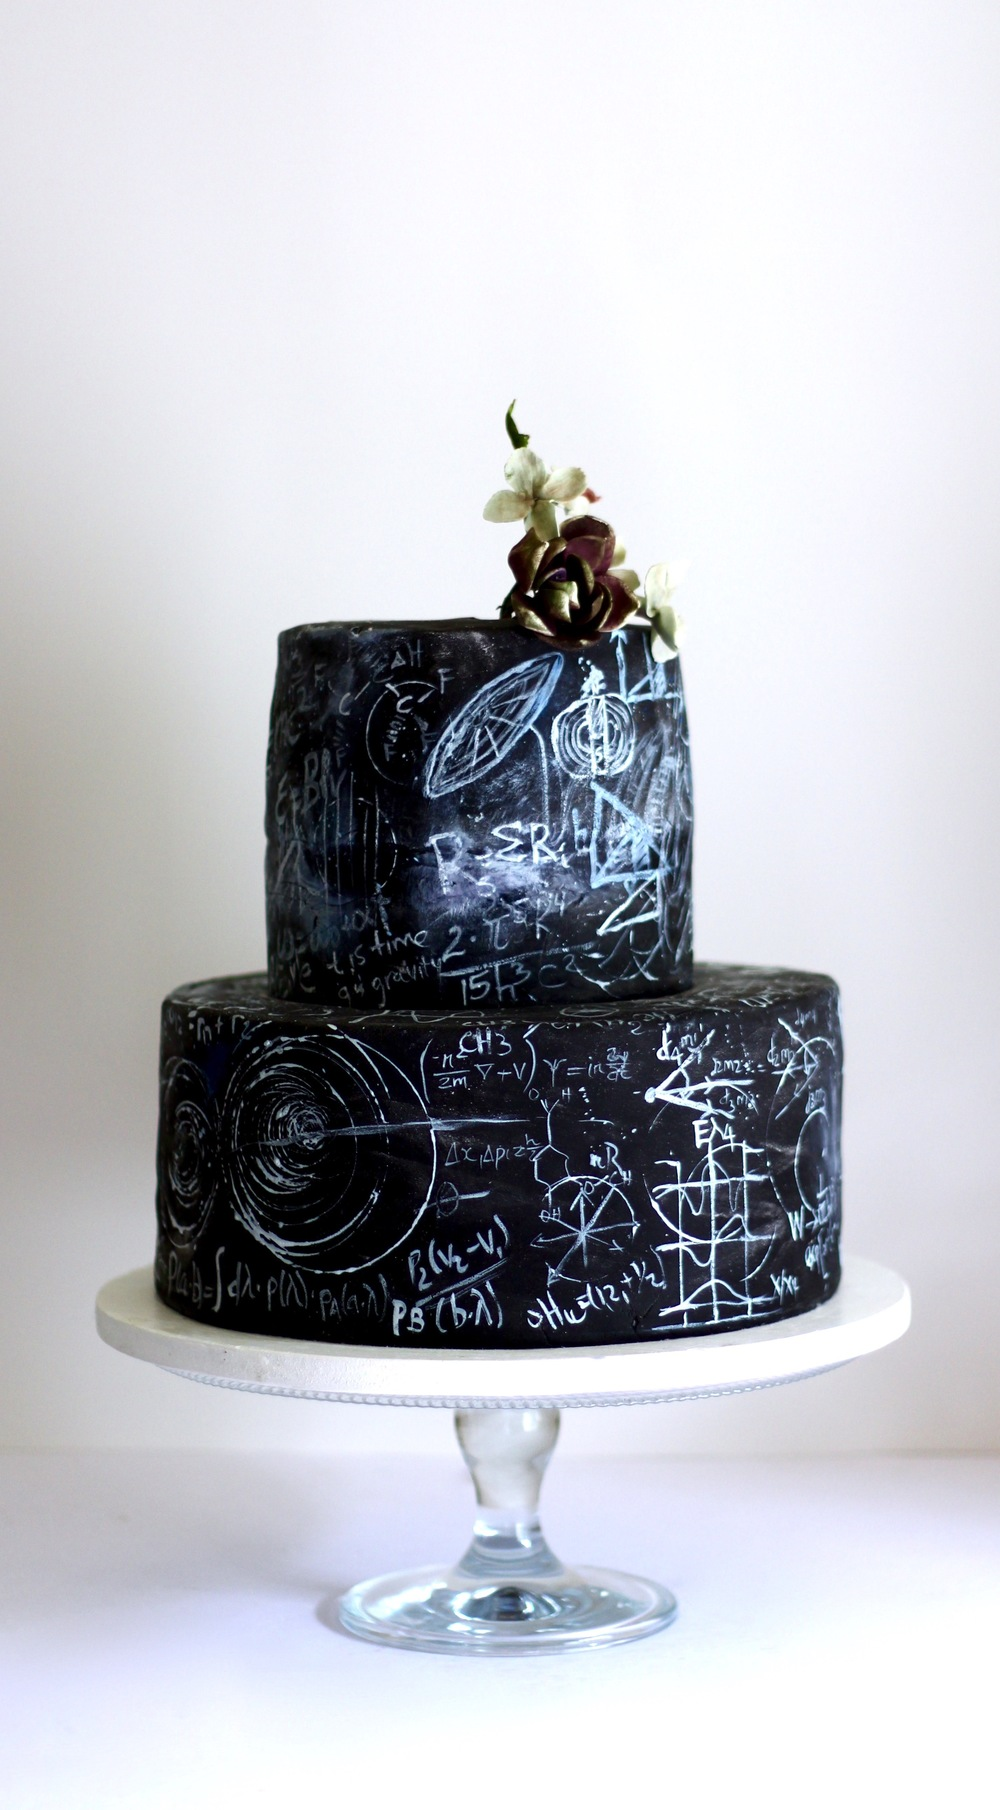 chalkboard wedding cake trinidad and tobago by jaime gerard cake